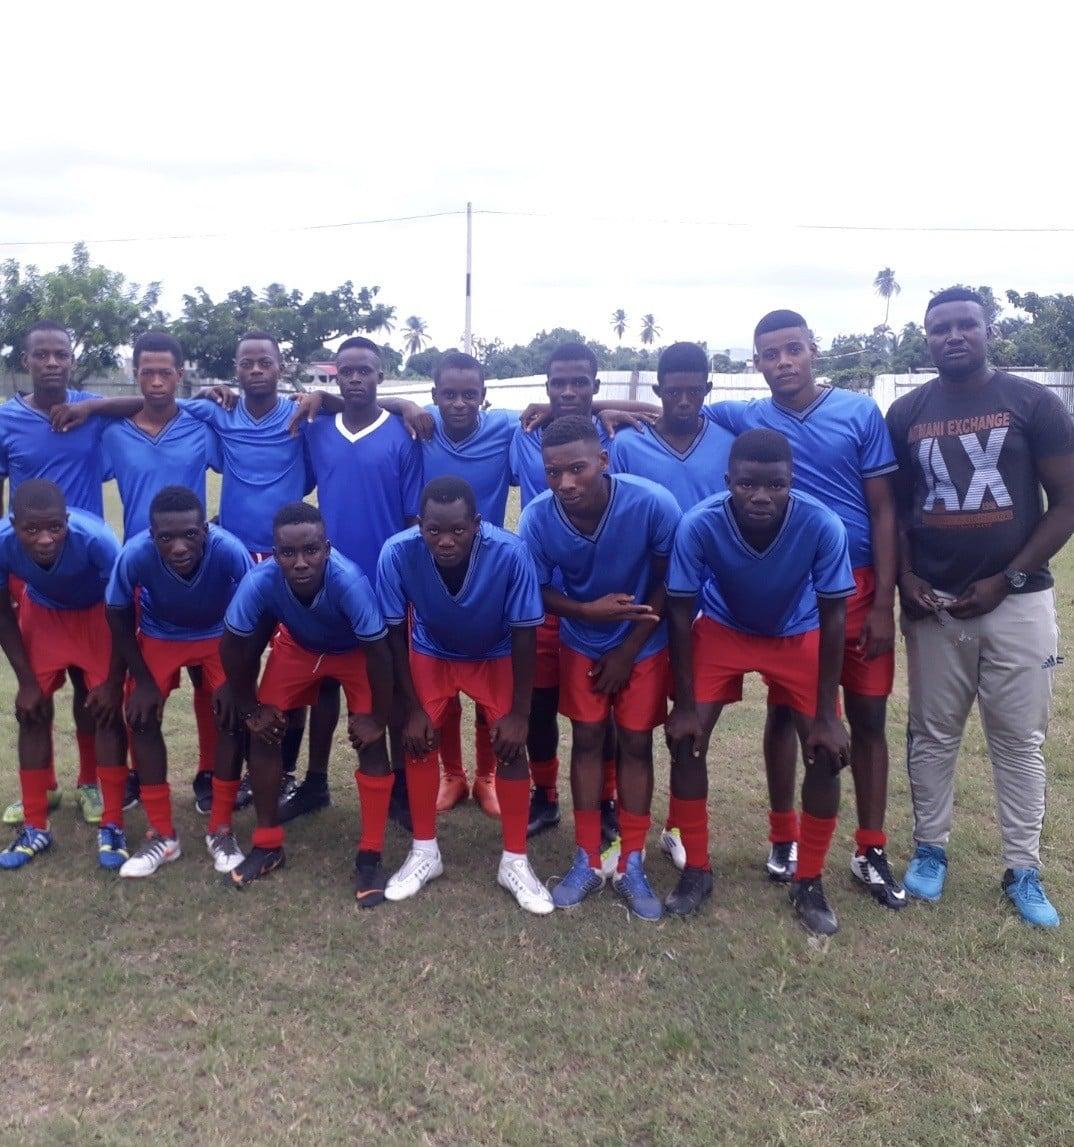 LNFJH Reaches 300 Team Milestone